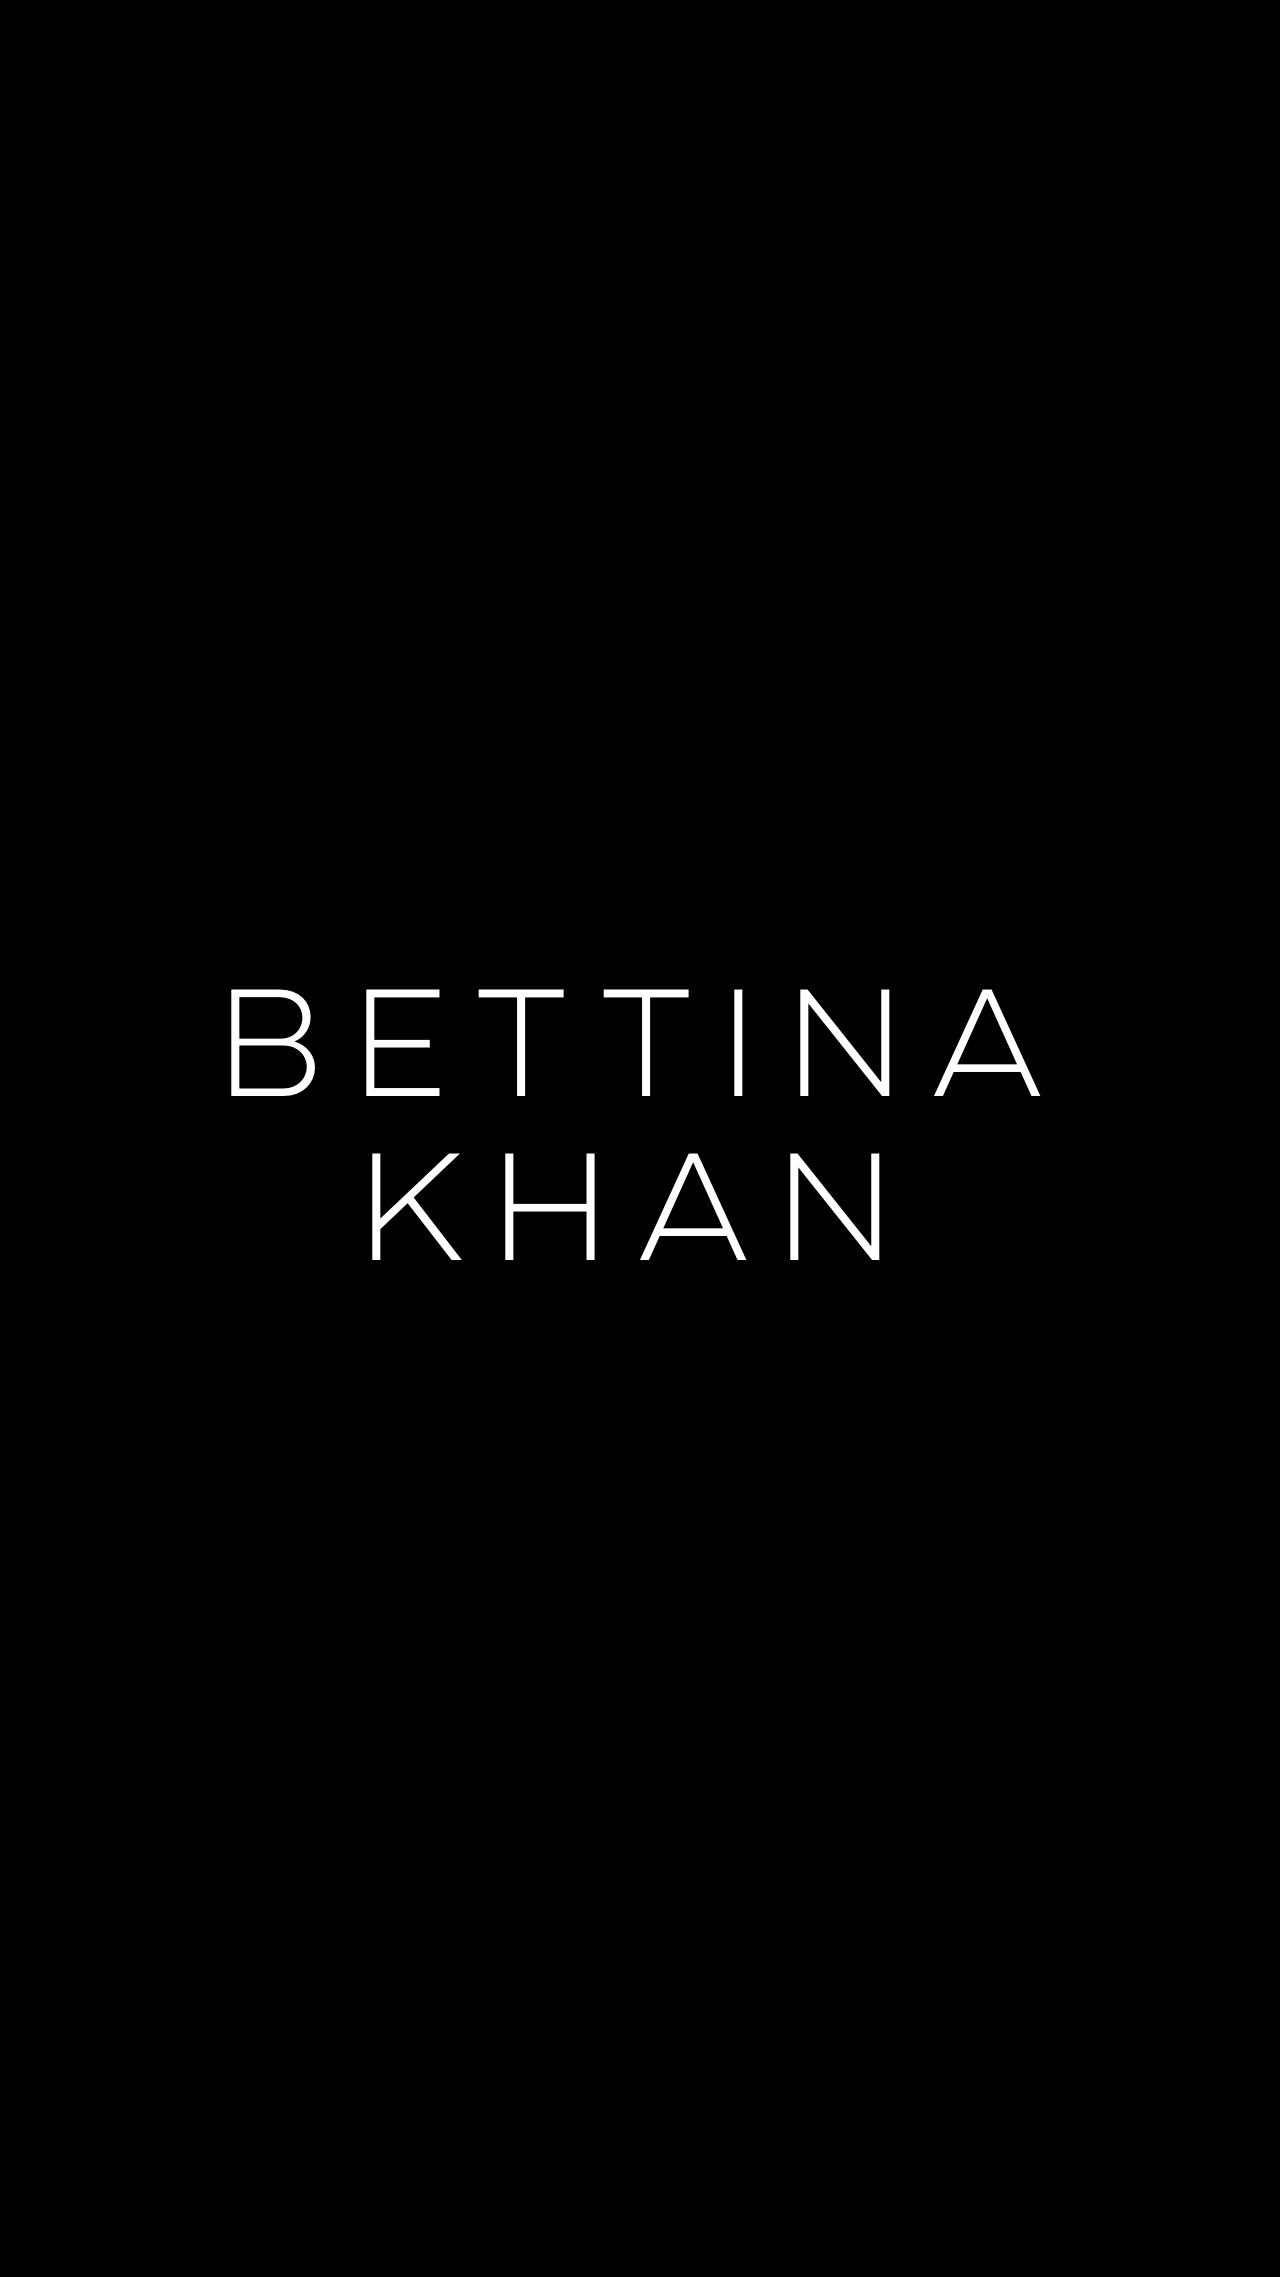 BETTINA KHAN (2).jpg